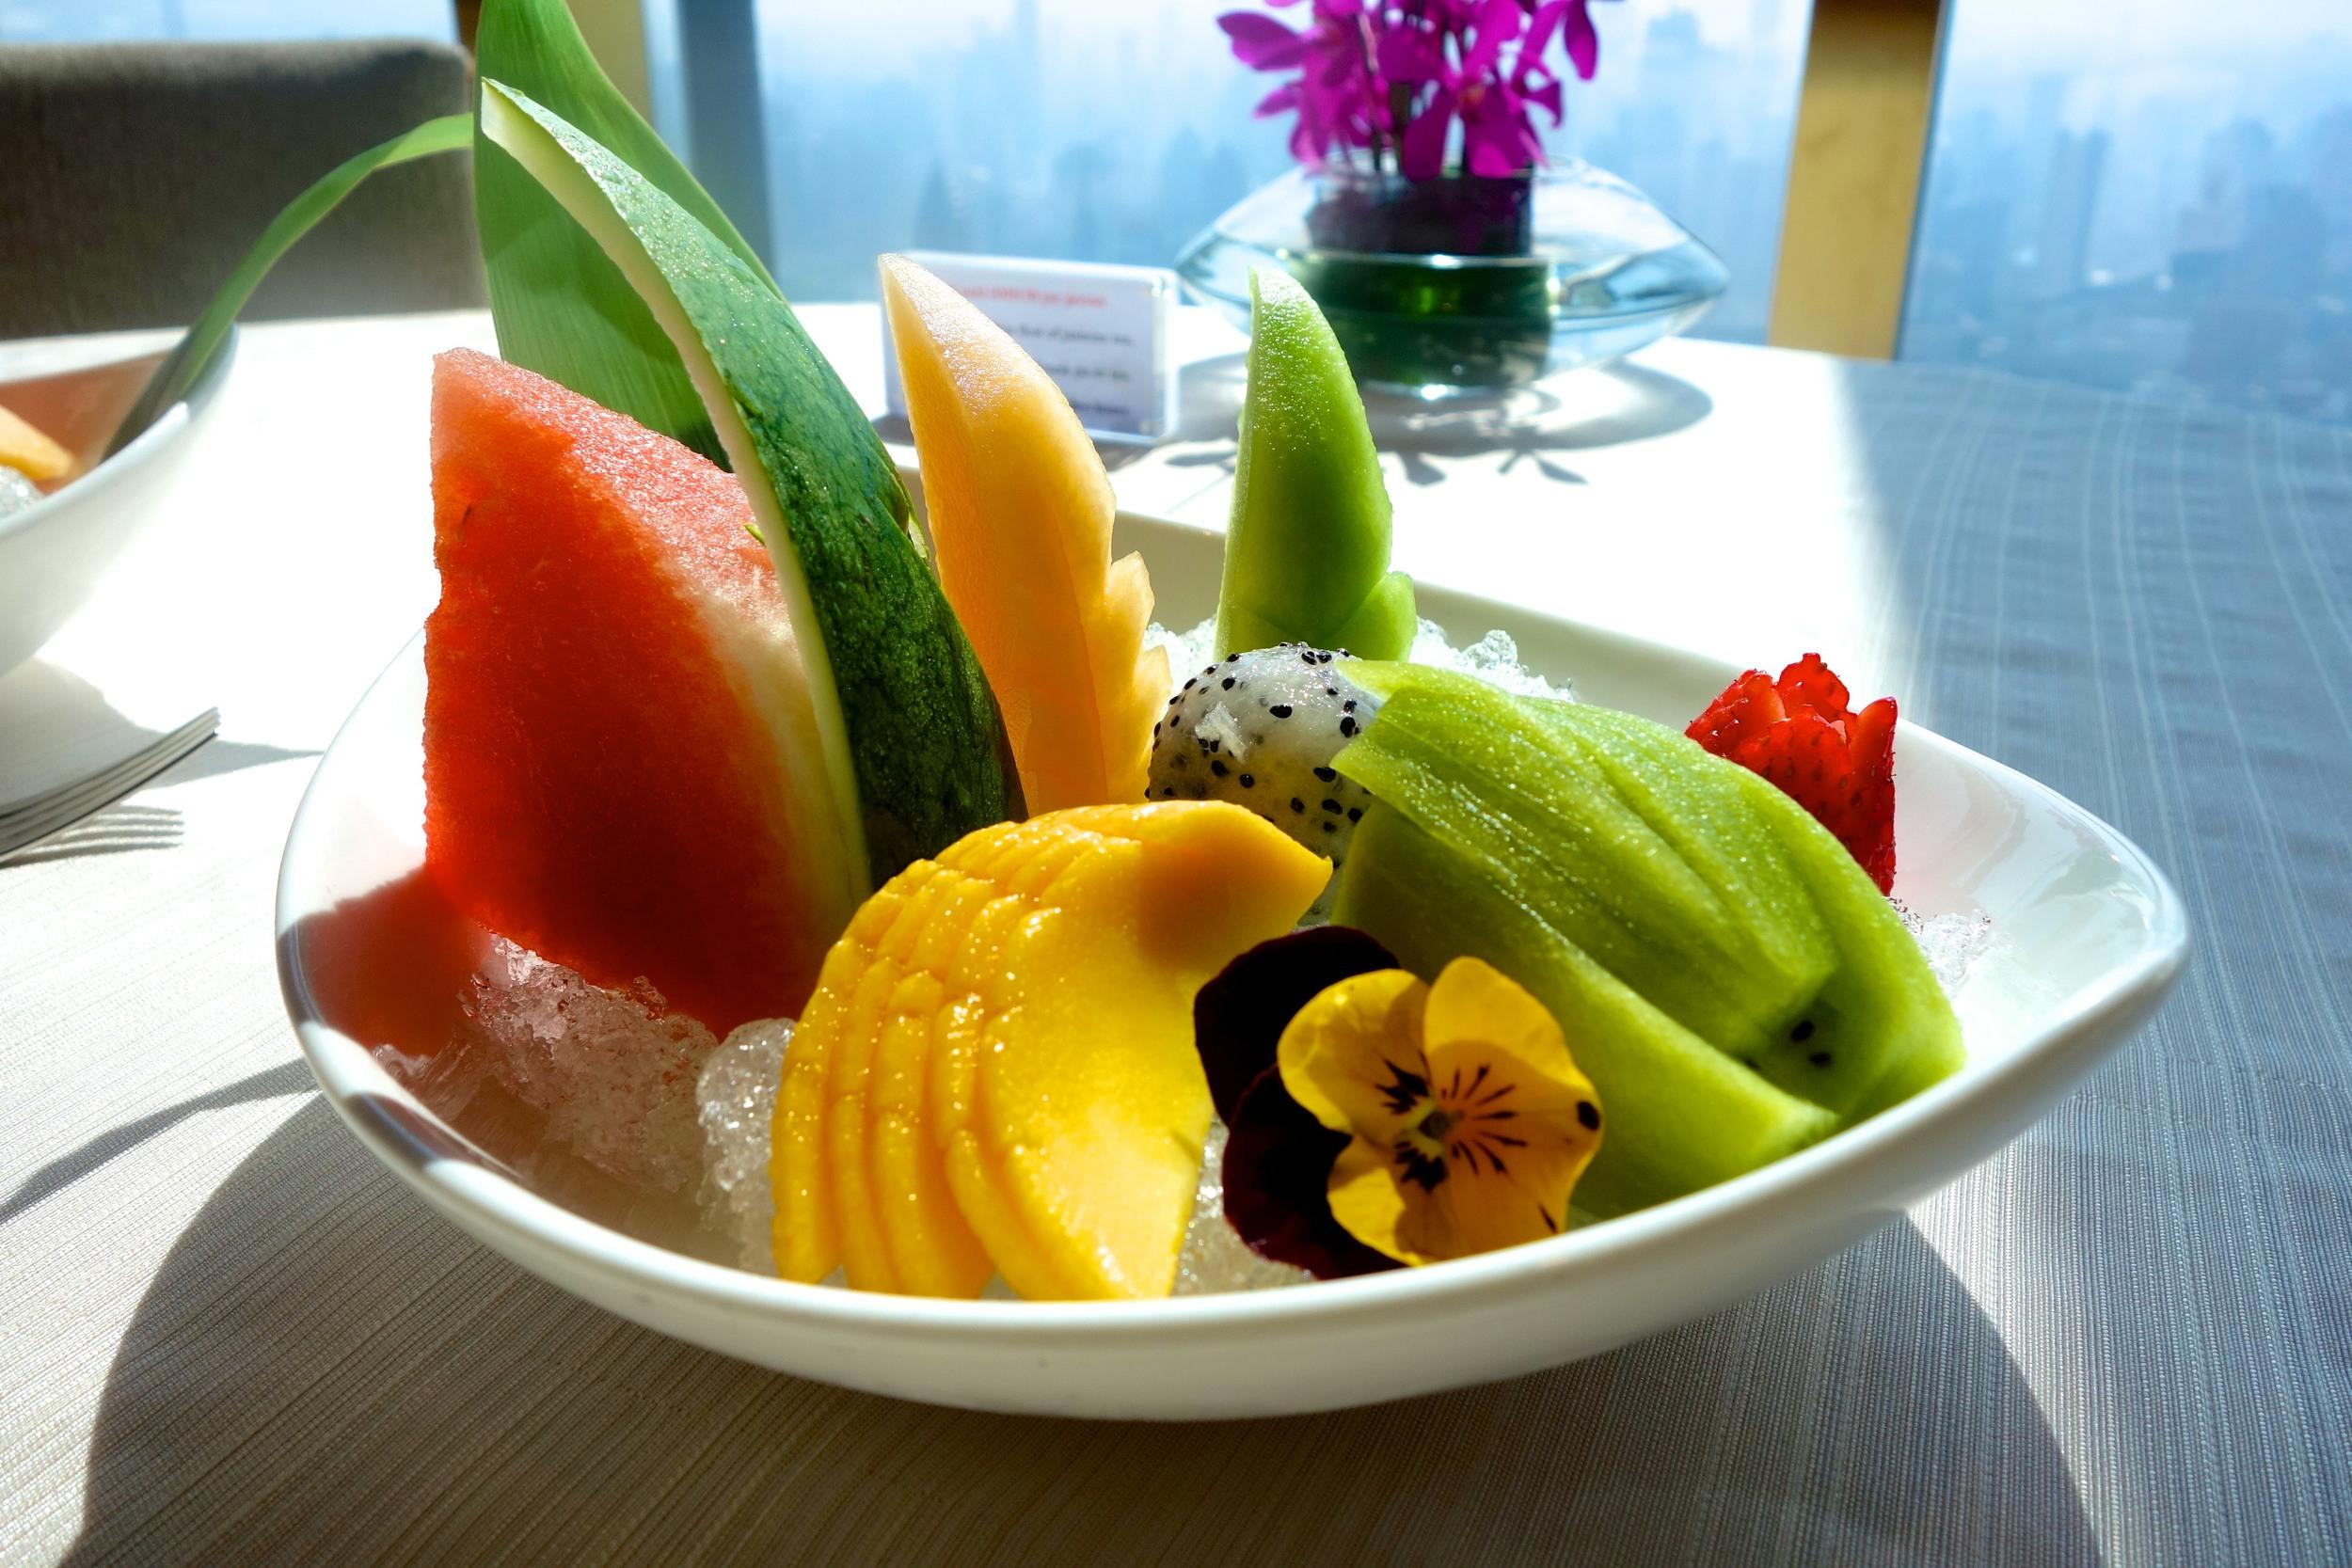 Dish 6: fruit platter